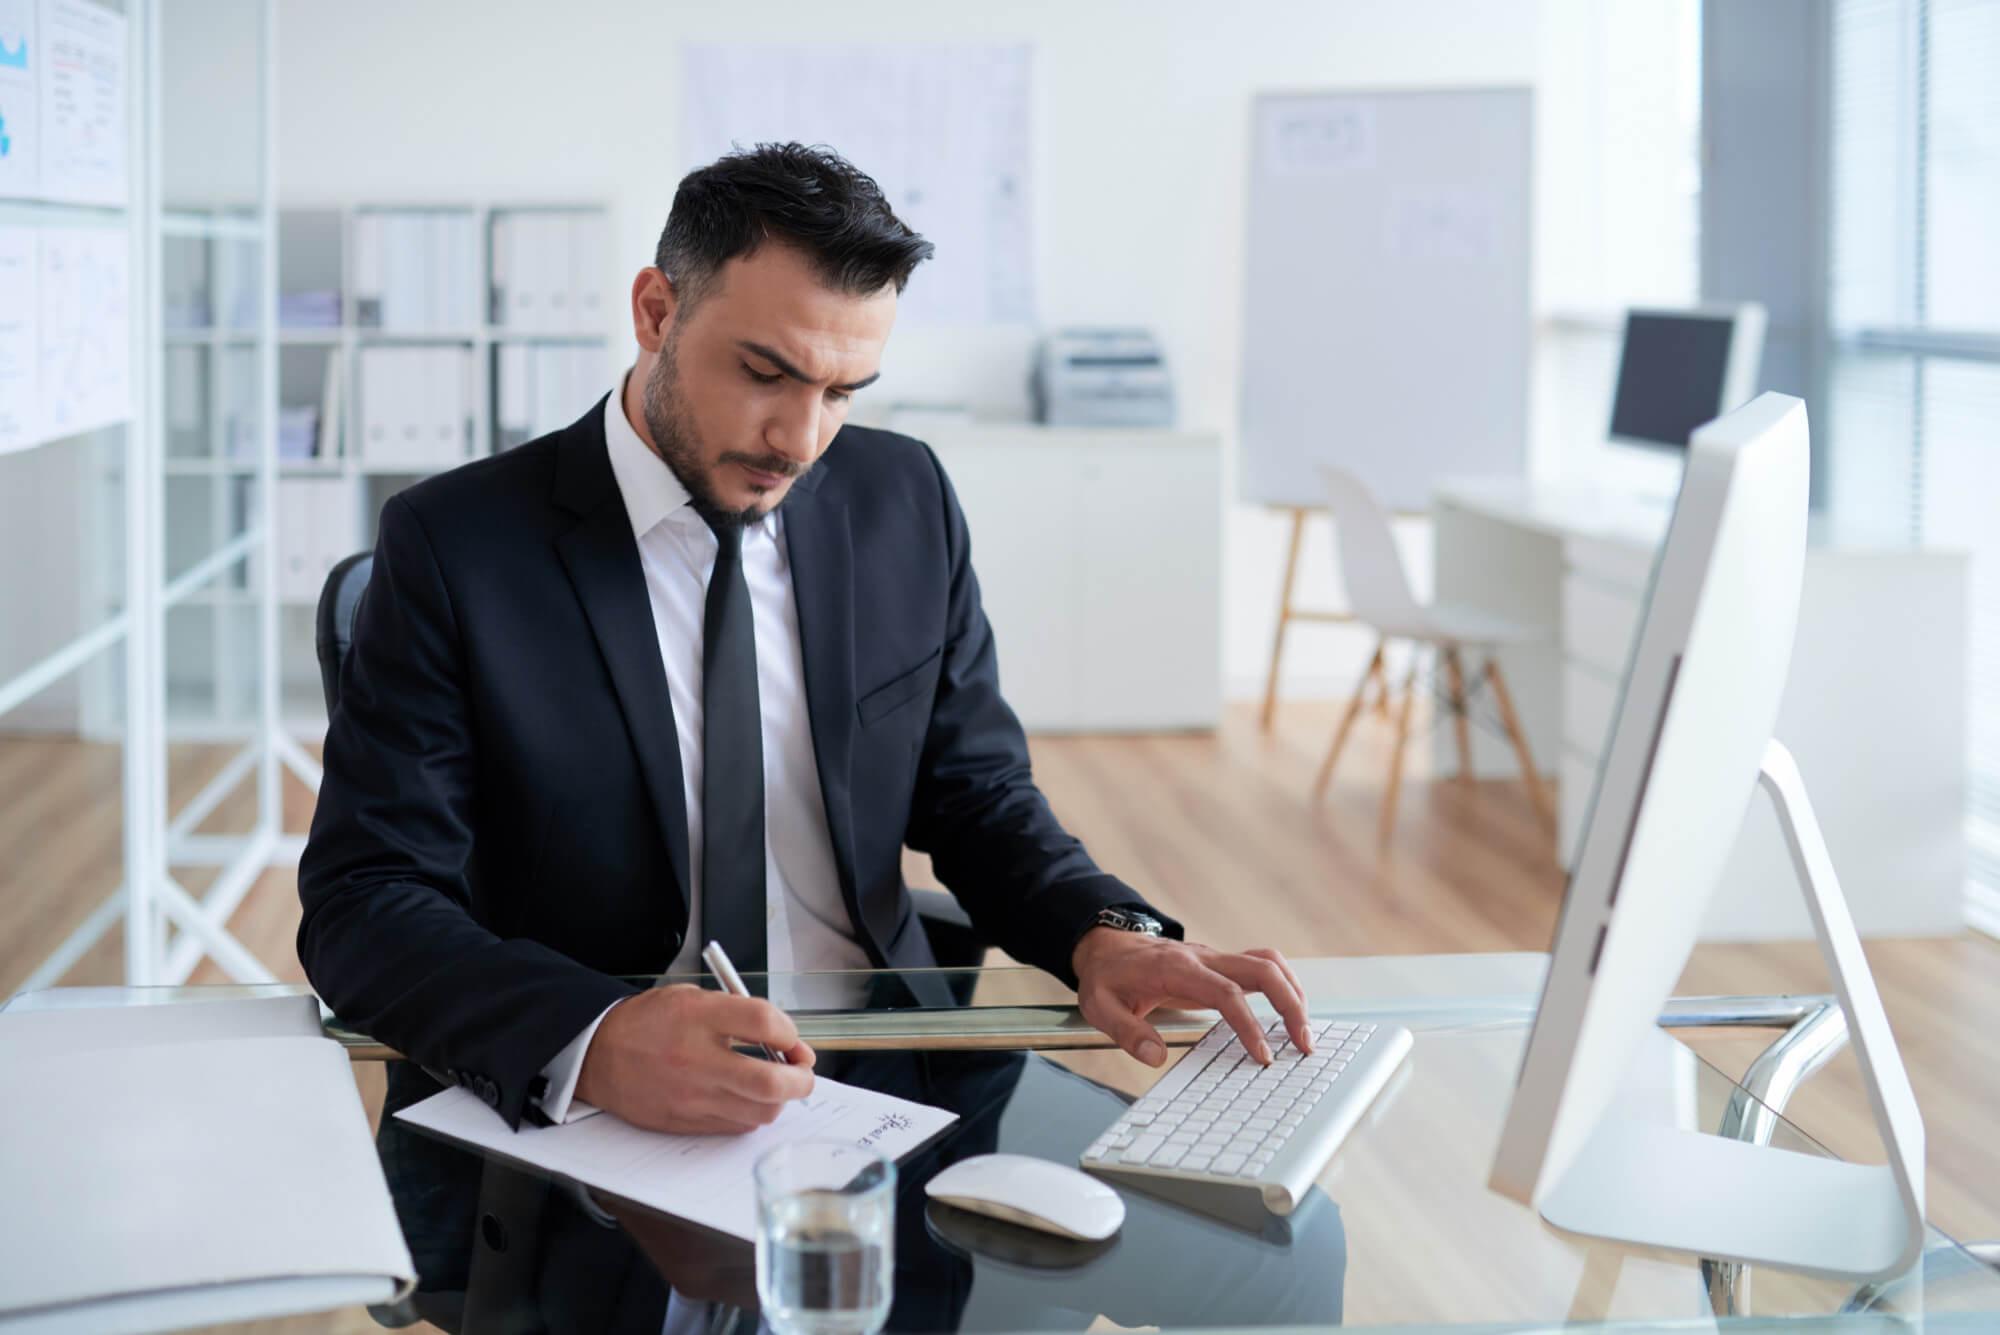 UK companies need more effective boards of directors